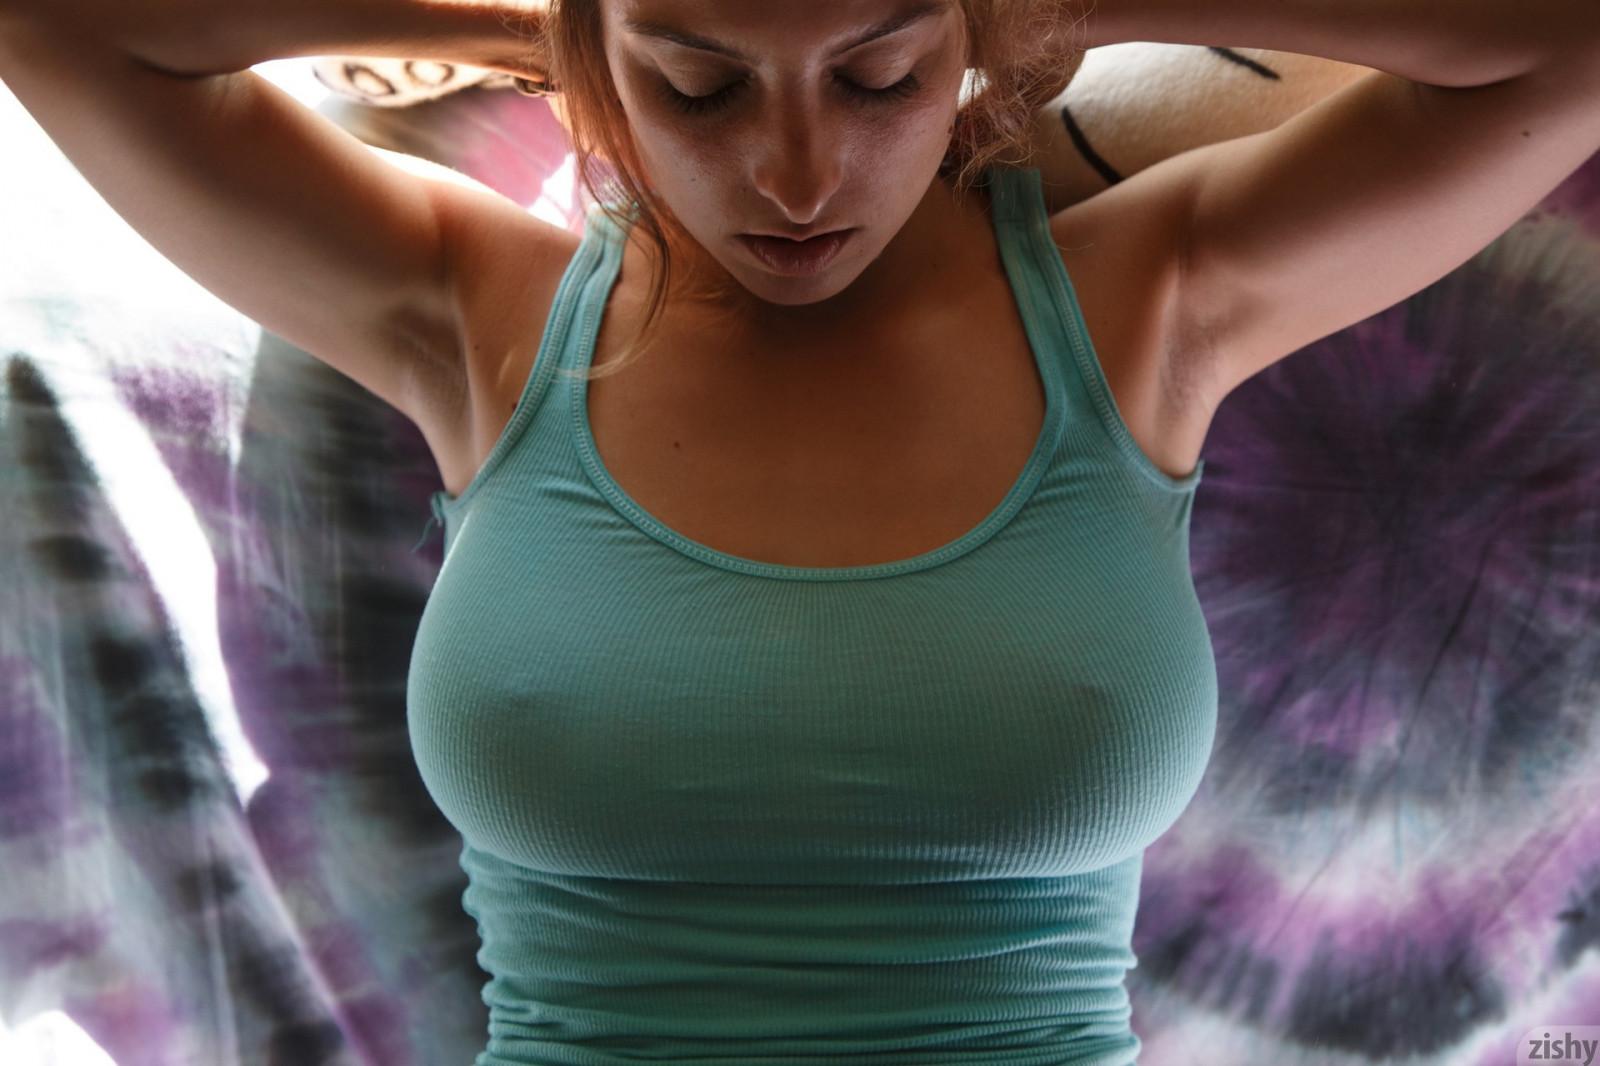 Wallpaper : women, model, photography, big boobs, armpits